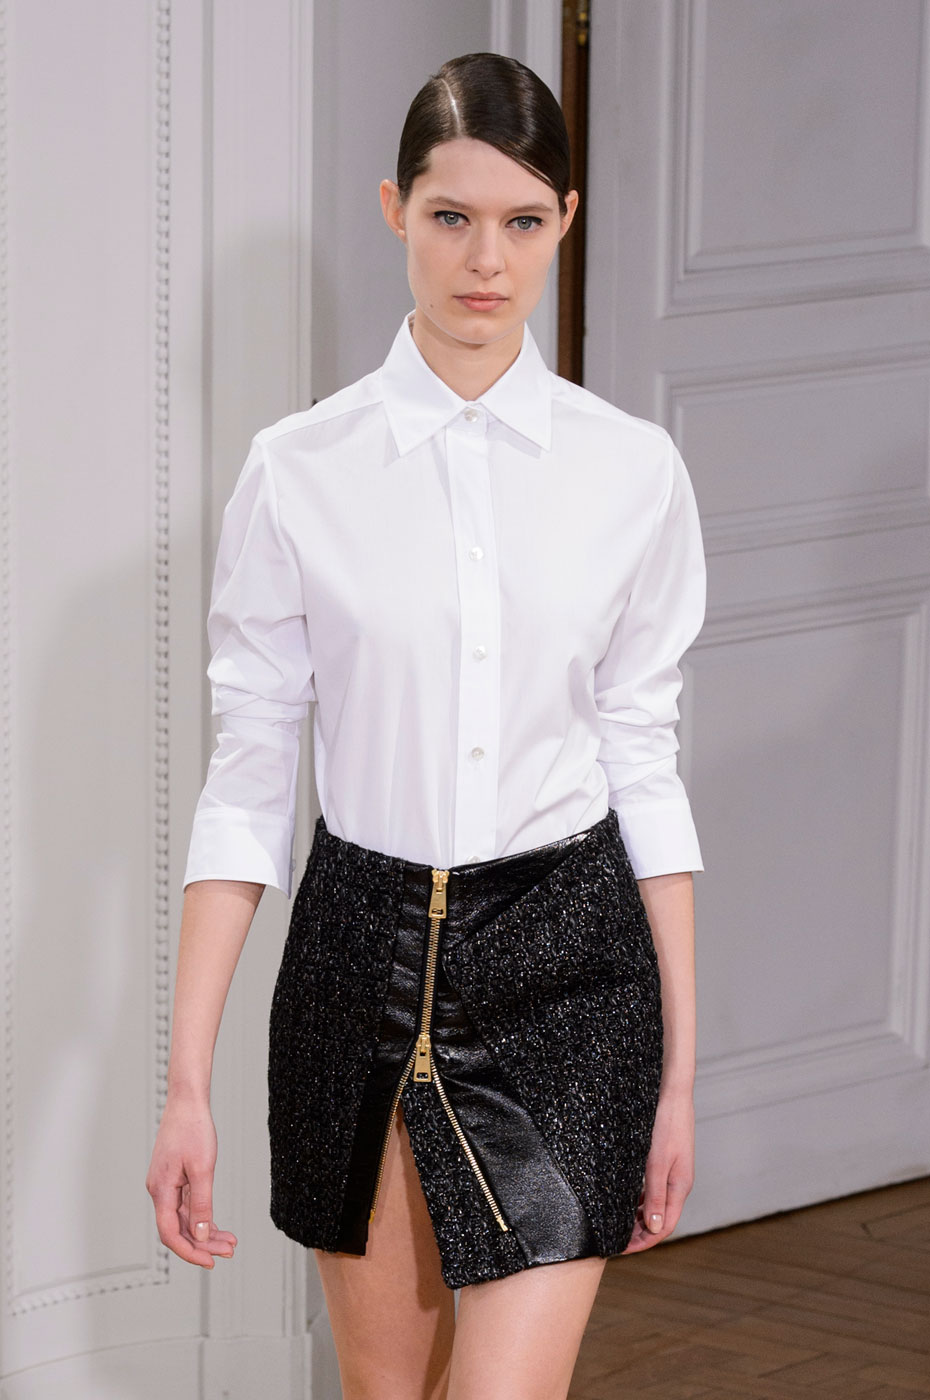 Bouchra-Jarrar-fashion-runway-show-haute-couture-paris-spring-summer-2015-the-impression-32